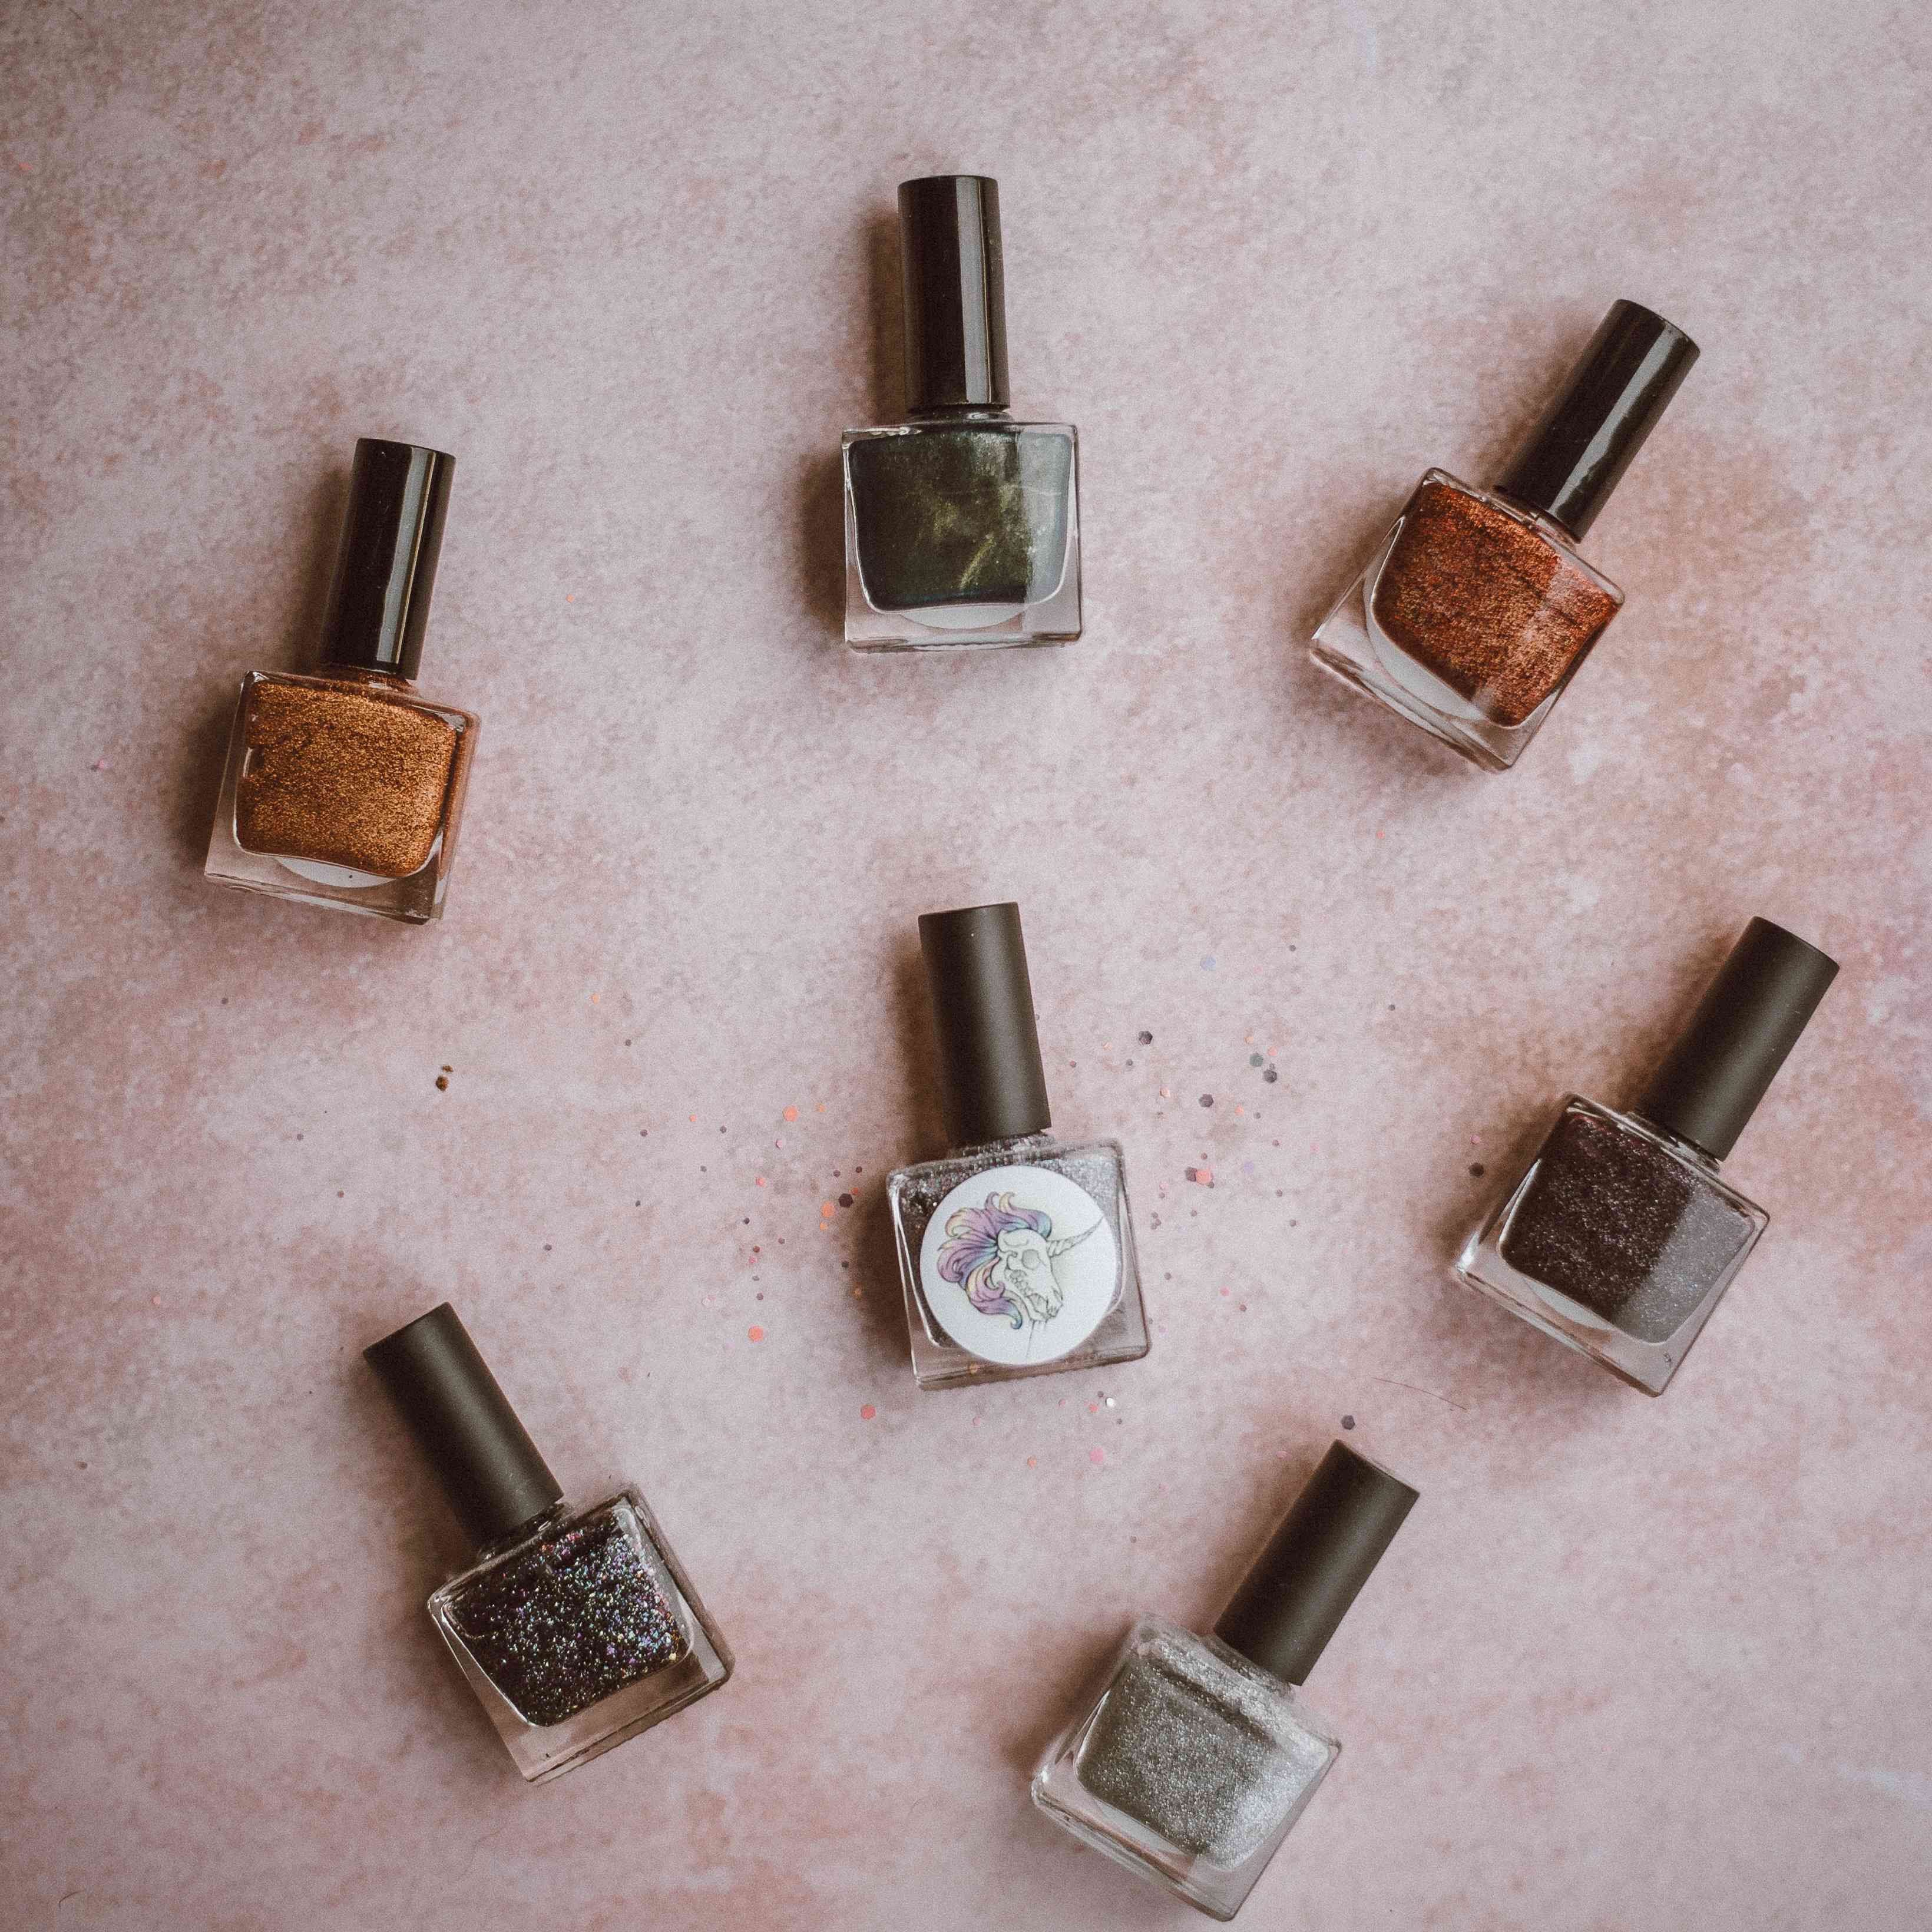 nail polish bottle scattered on carpet